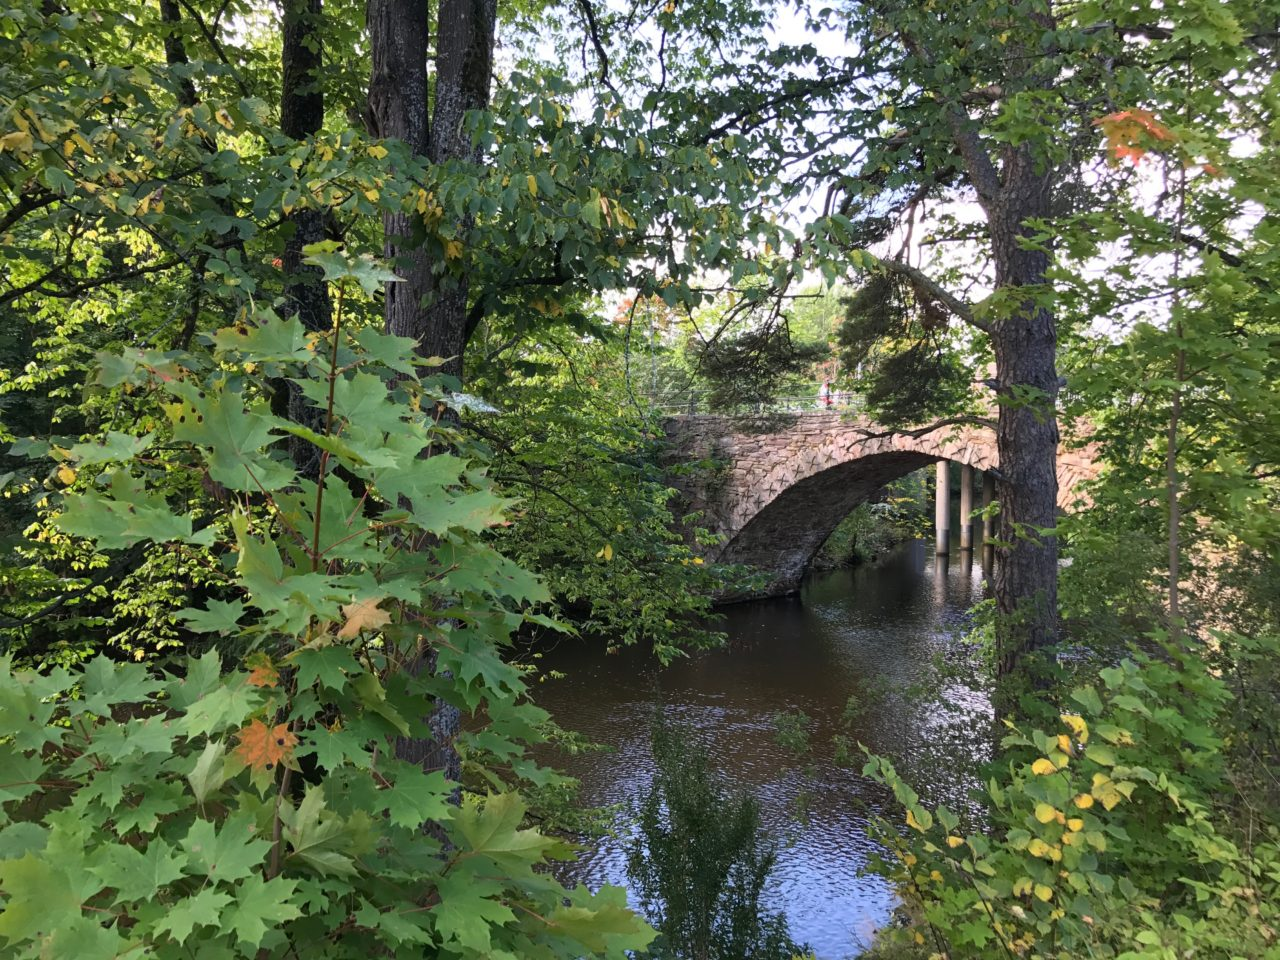 Stone Arch Bridge Of Stream With Trees